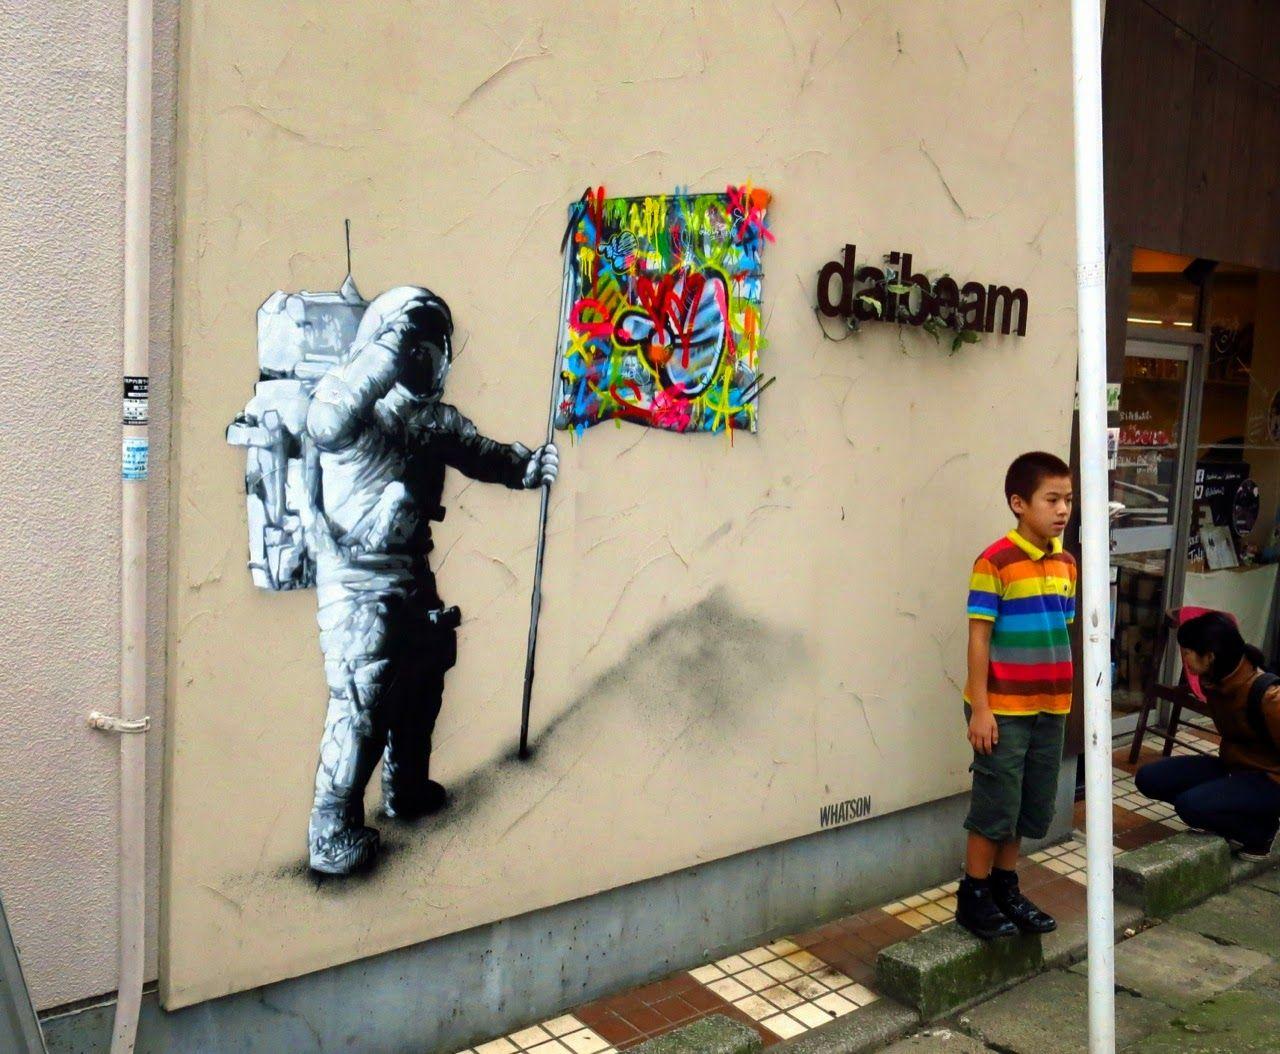 Martin whatson new mural graffiti i graffiti styles street art love tokyo streets